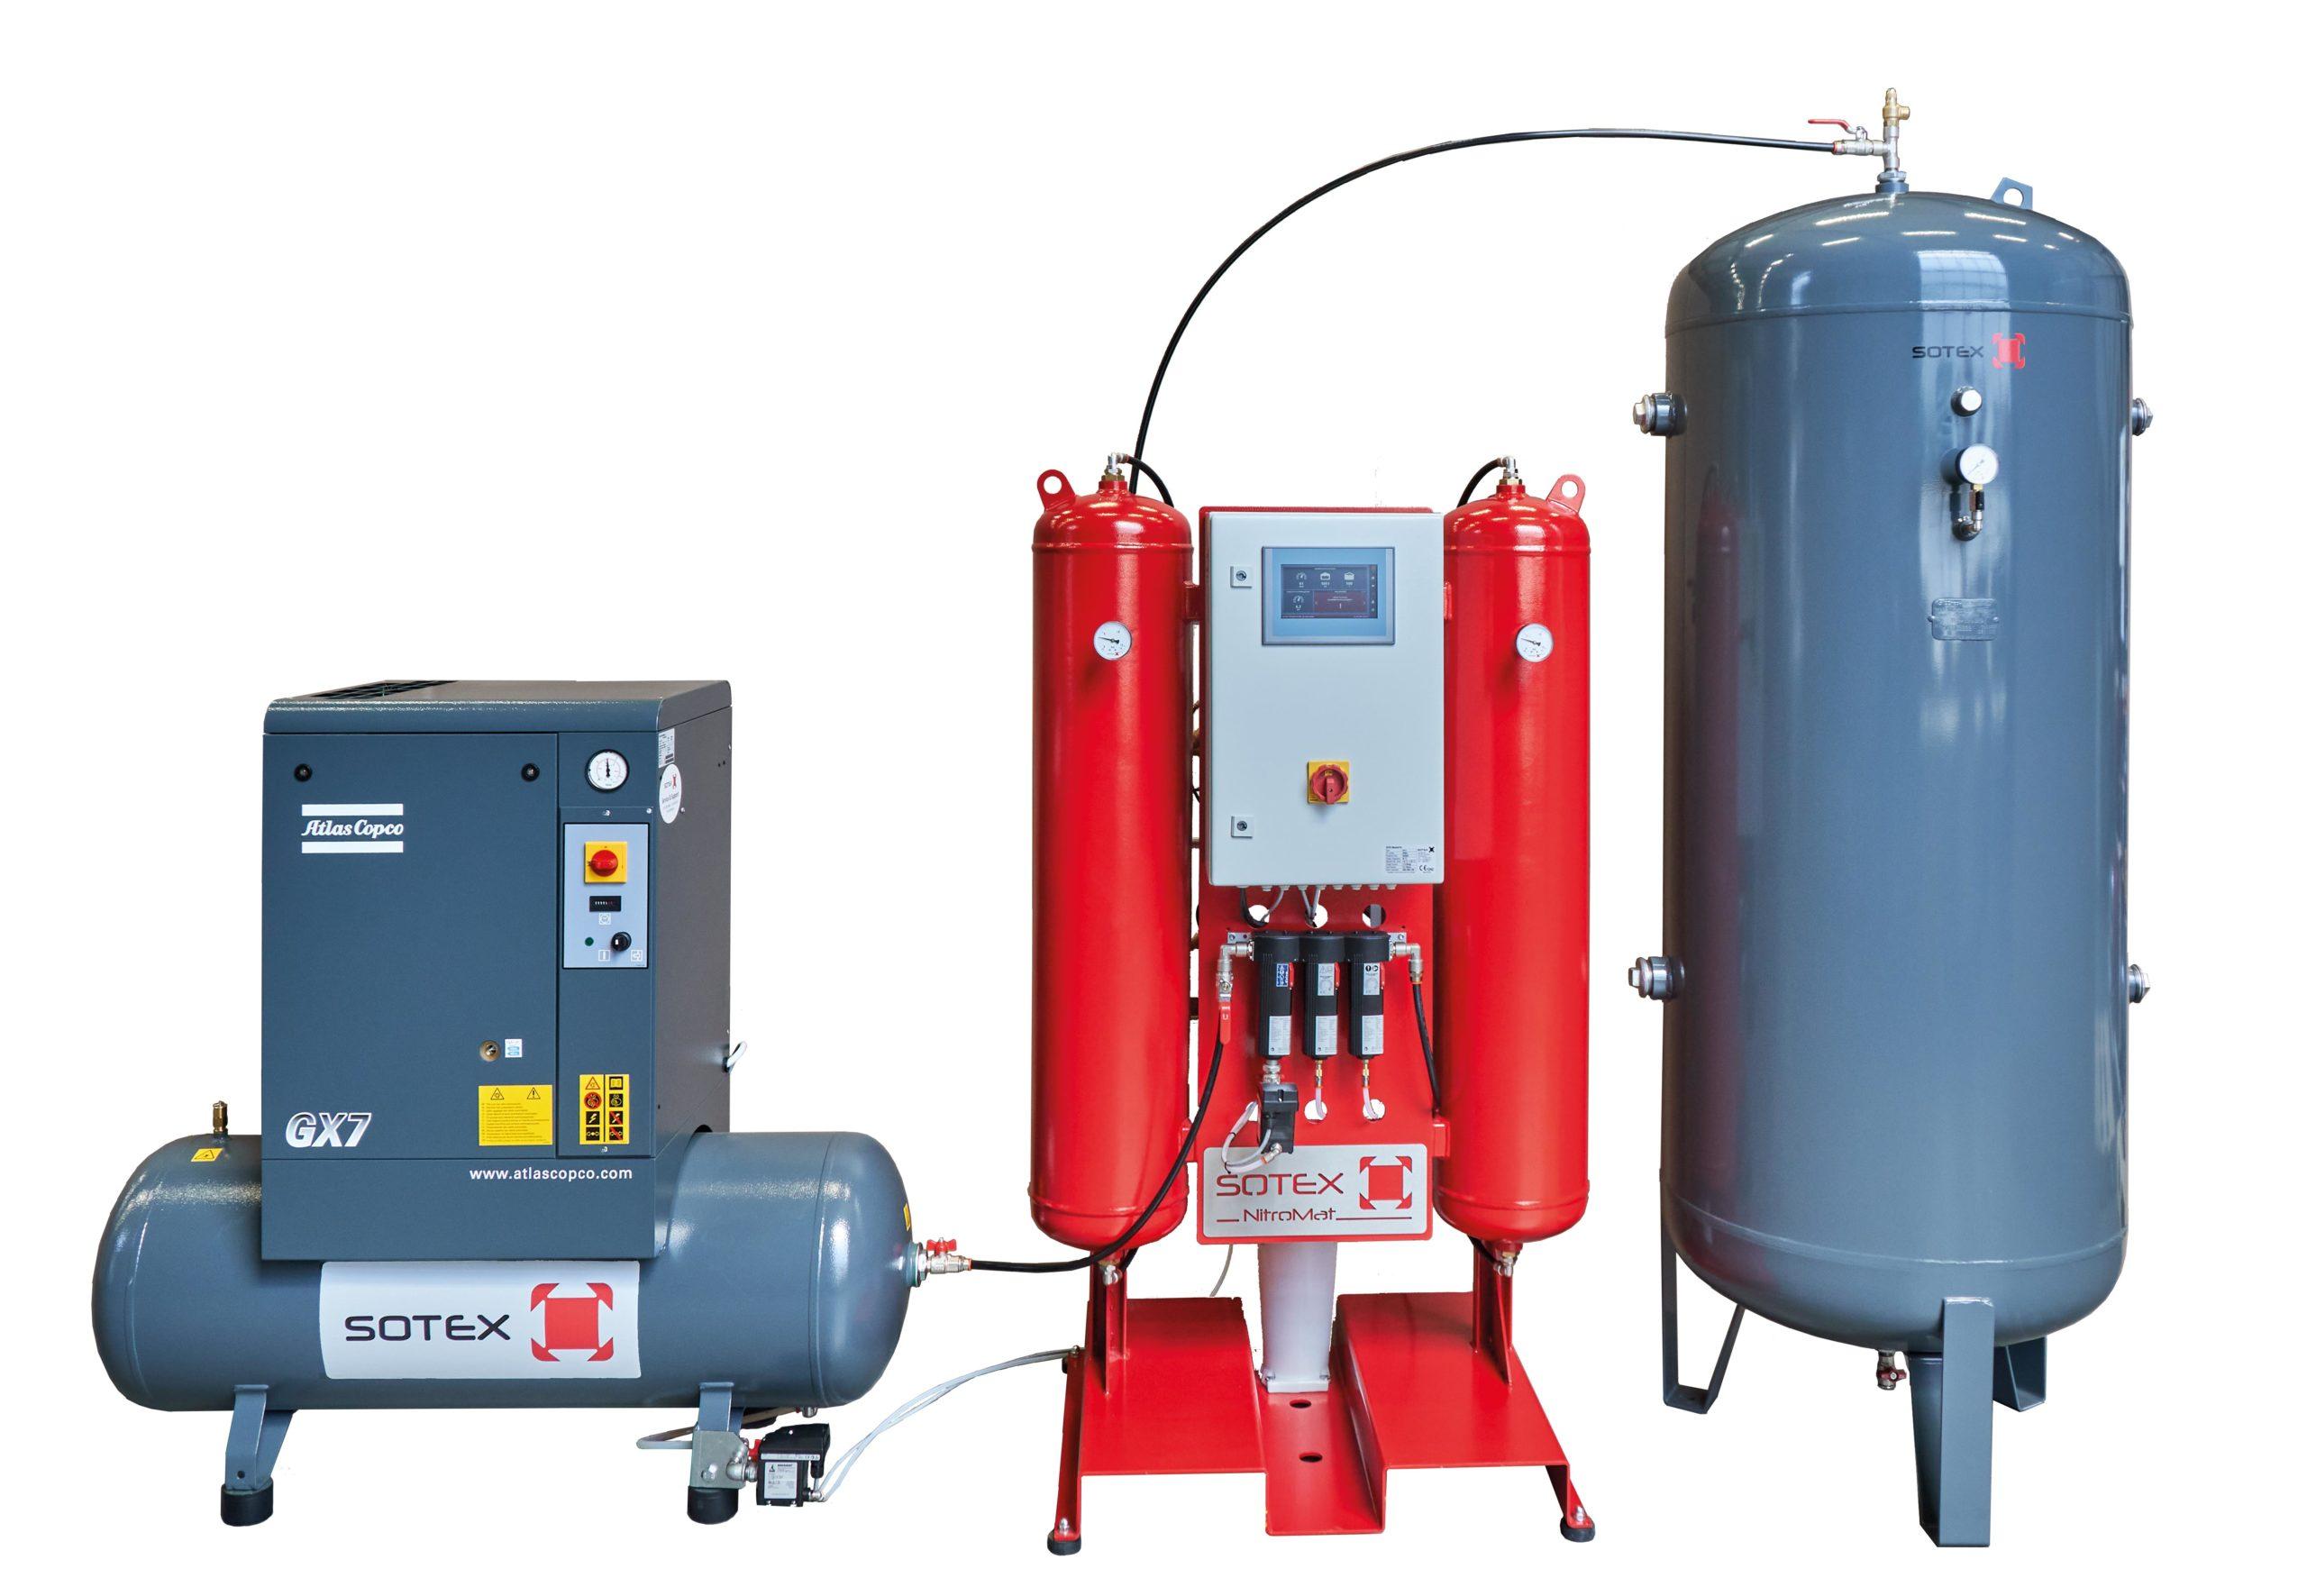 SOTEX stikstof expansiesysteem compleet